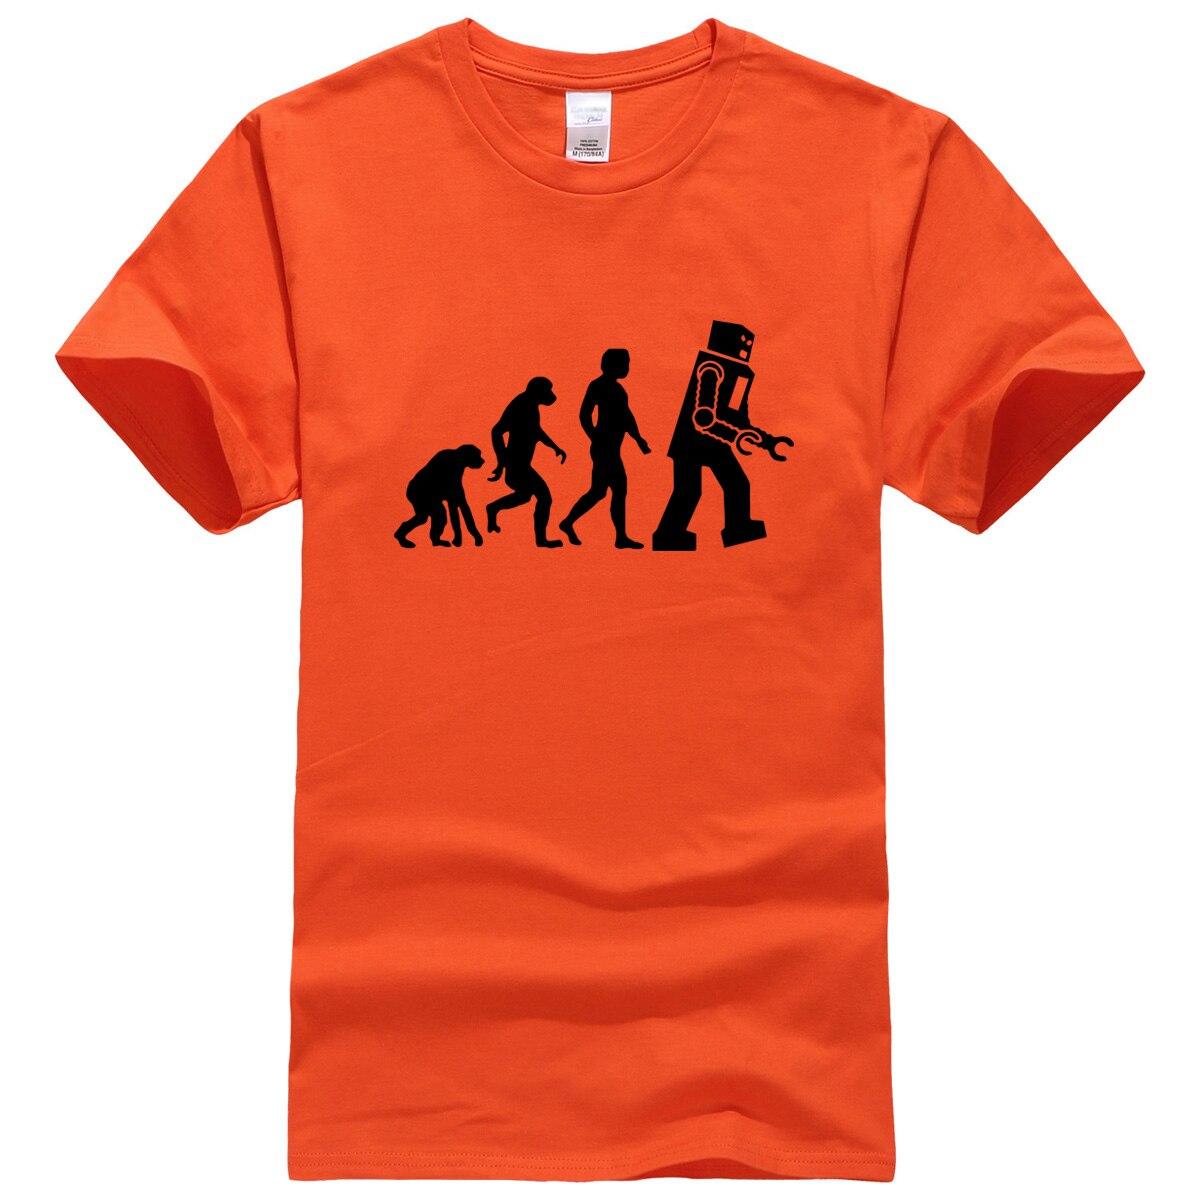 2017 T-shirts The Big Bang Theory Robot Evolution T-shirt tops summer casual men's T-shirts fitness kpop sportswear t shirt men